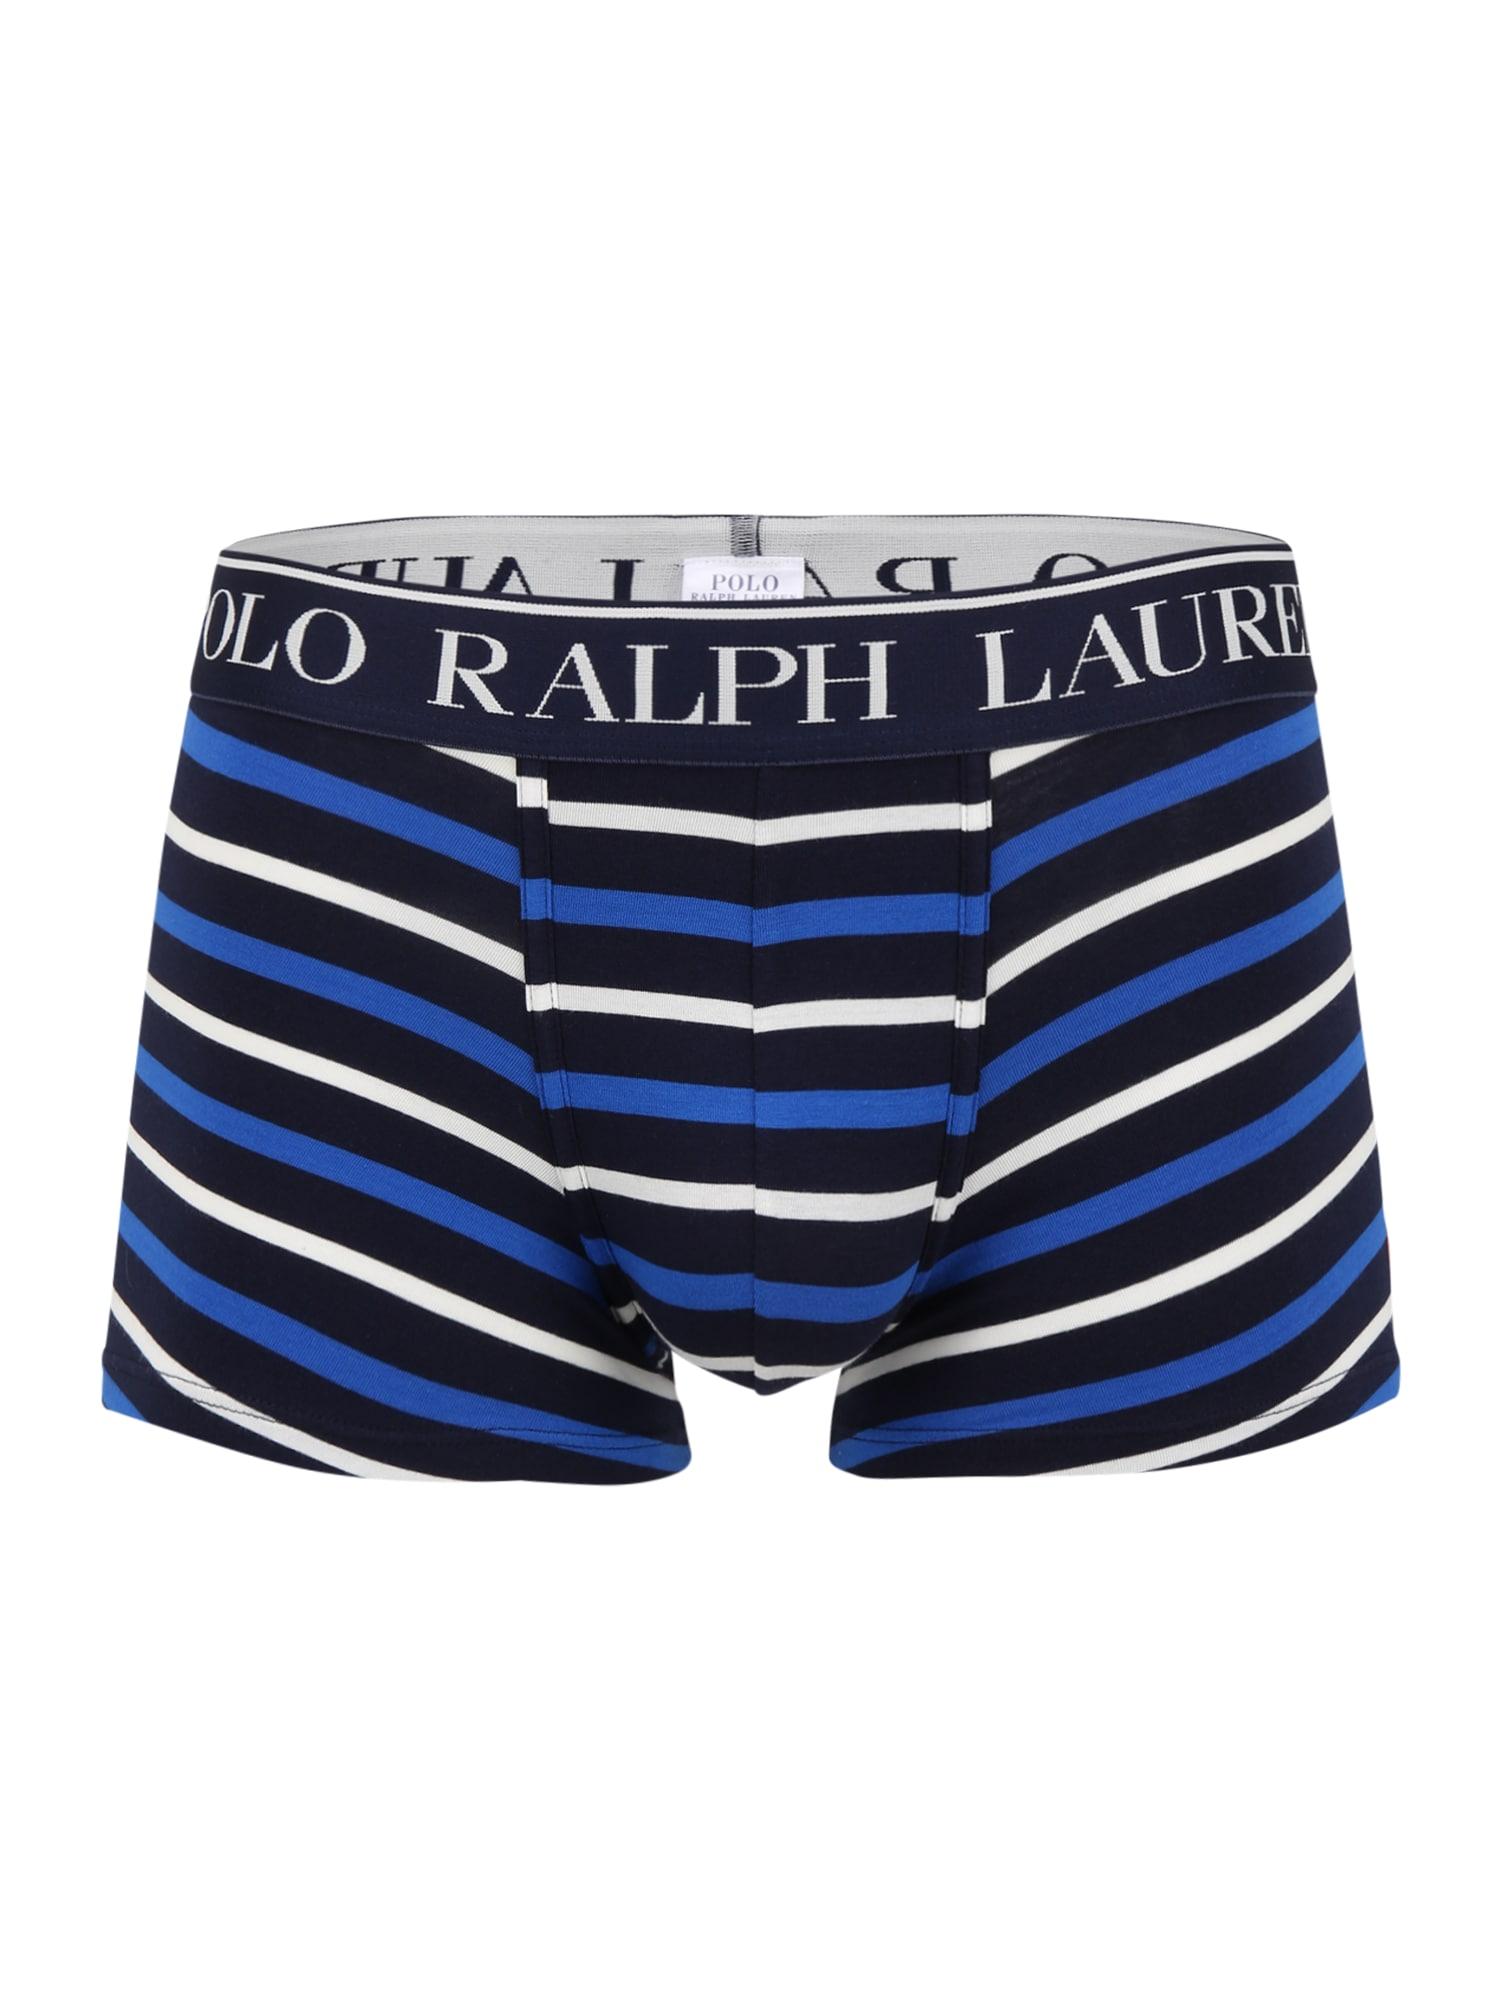 POLO RALPH LAUREN Boxer trumpikės mėlyna / kobalto mėlyna / balta